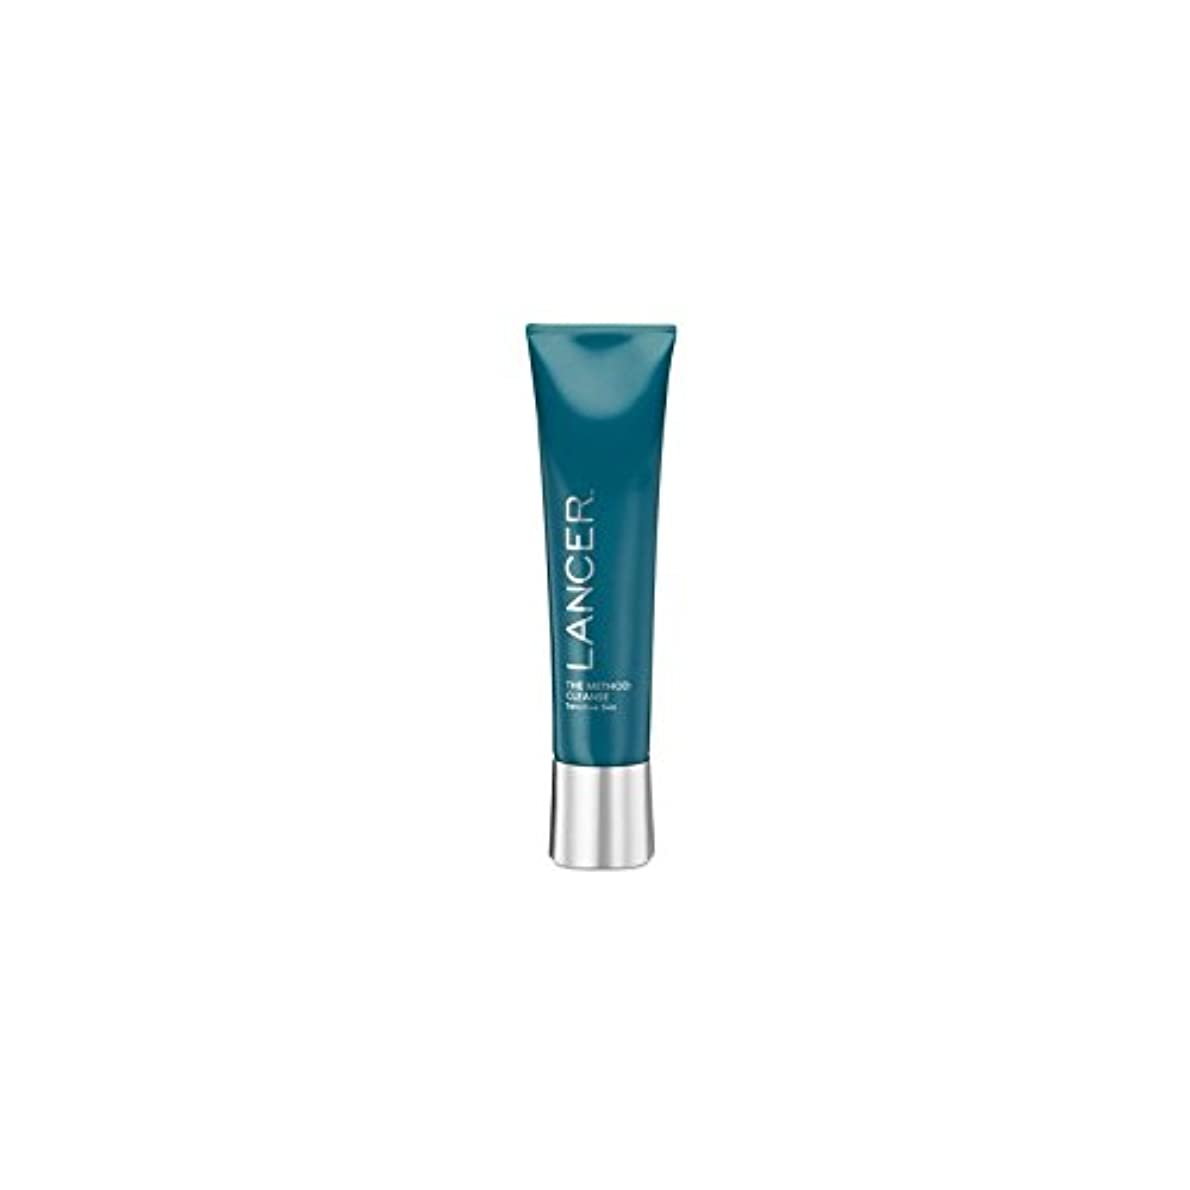 Lancer Skincare The Method: Cleanser Sensitive Skin (120ml) (Pack of 6) - クレンザー敏感肌(120ミリリットル):ランサーは、メソッドをスキンケア x6 [並行輸入品]